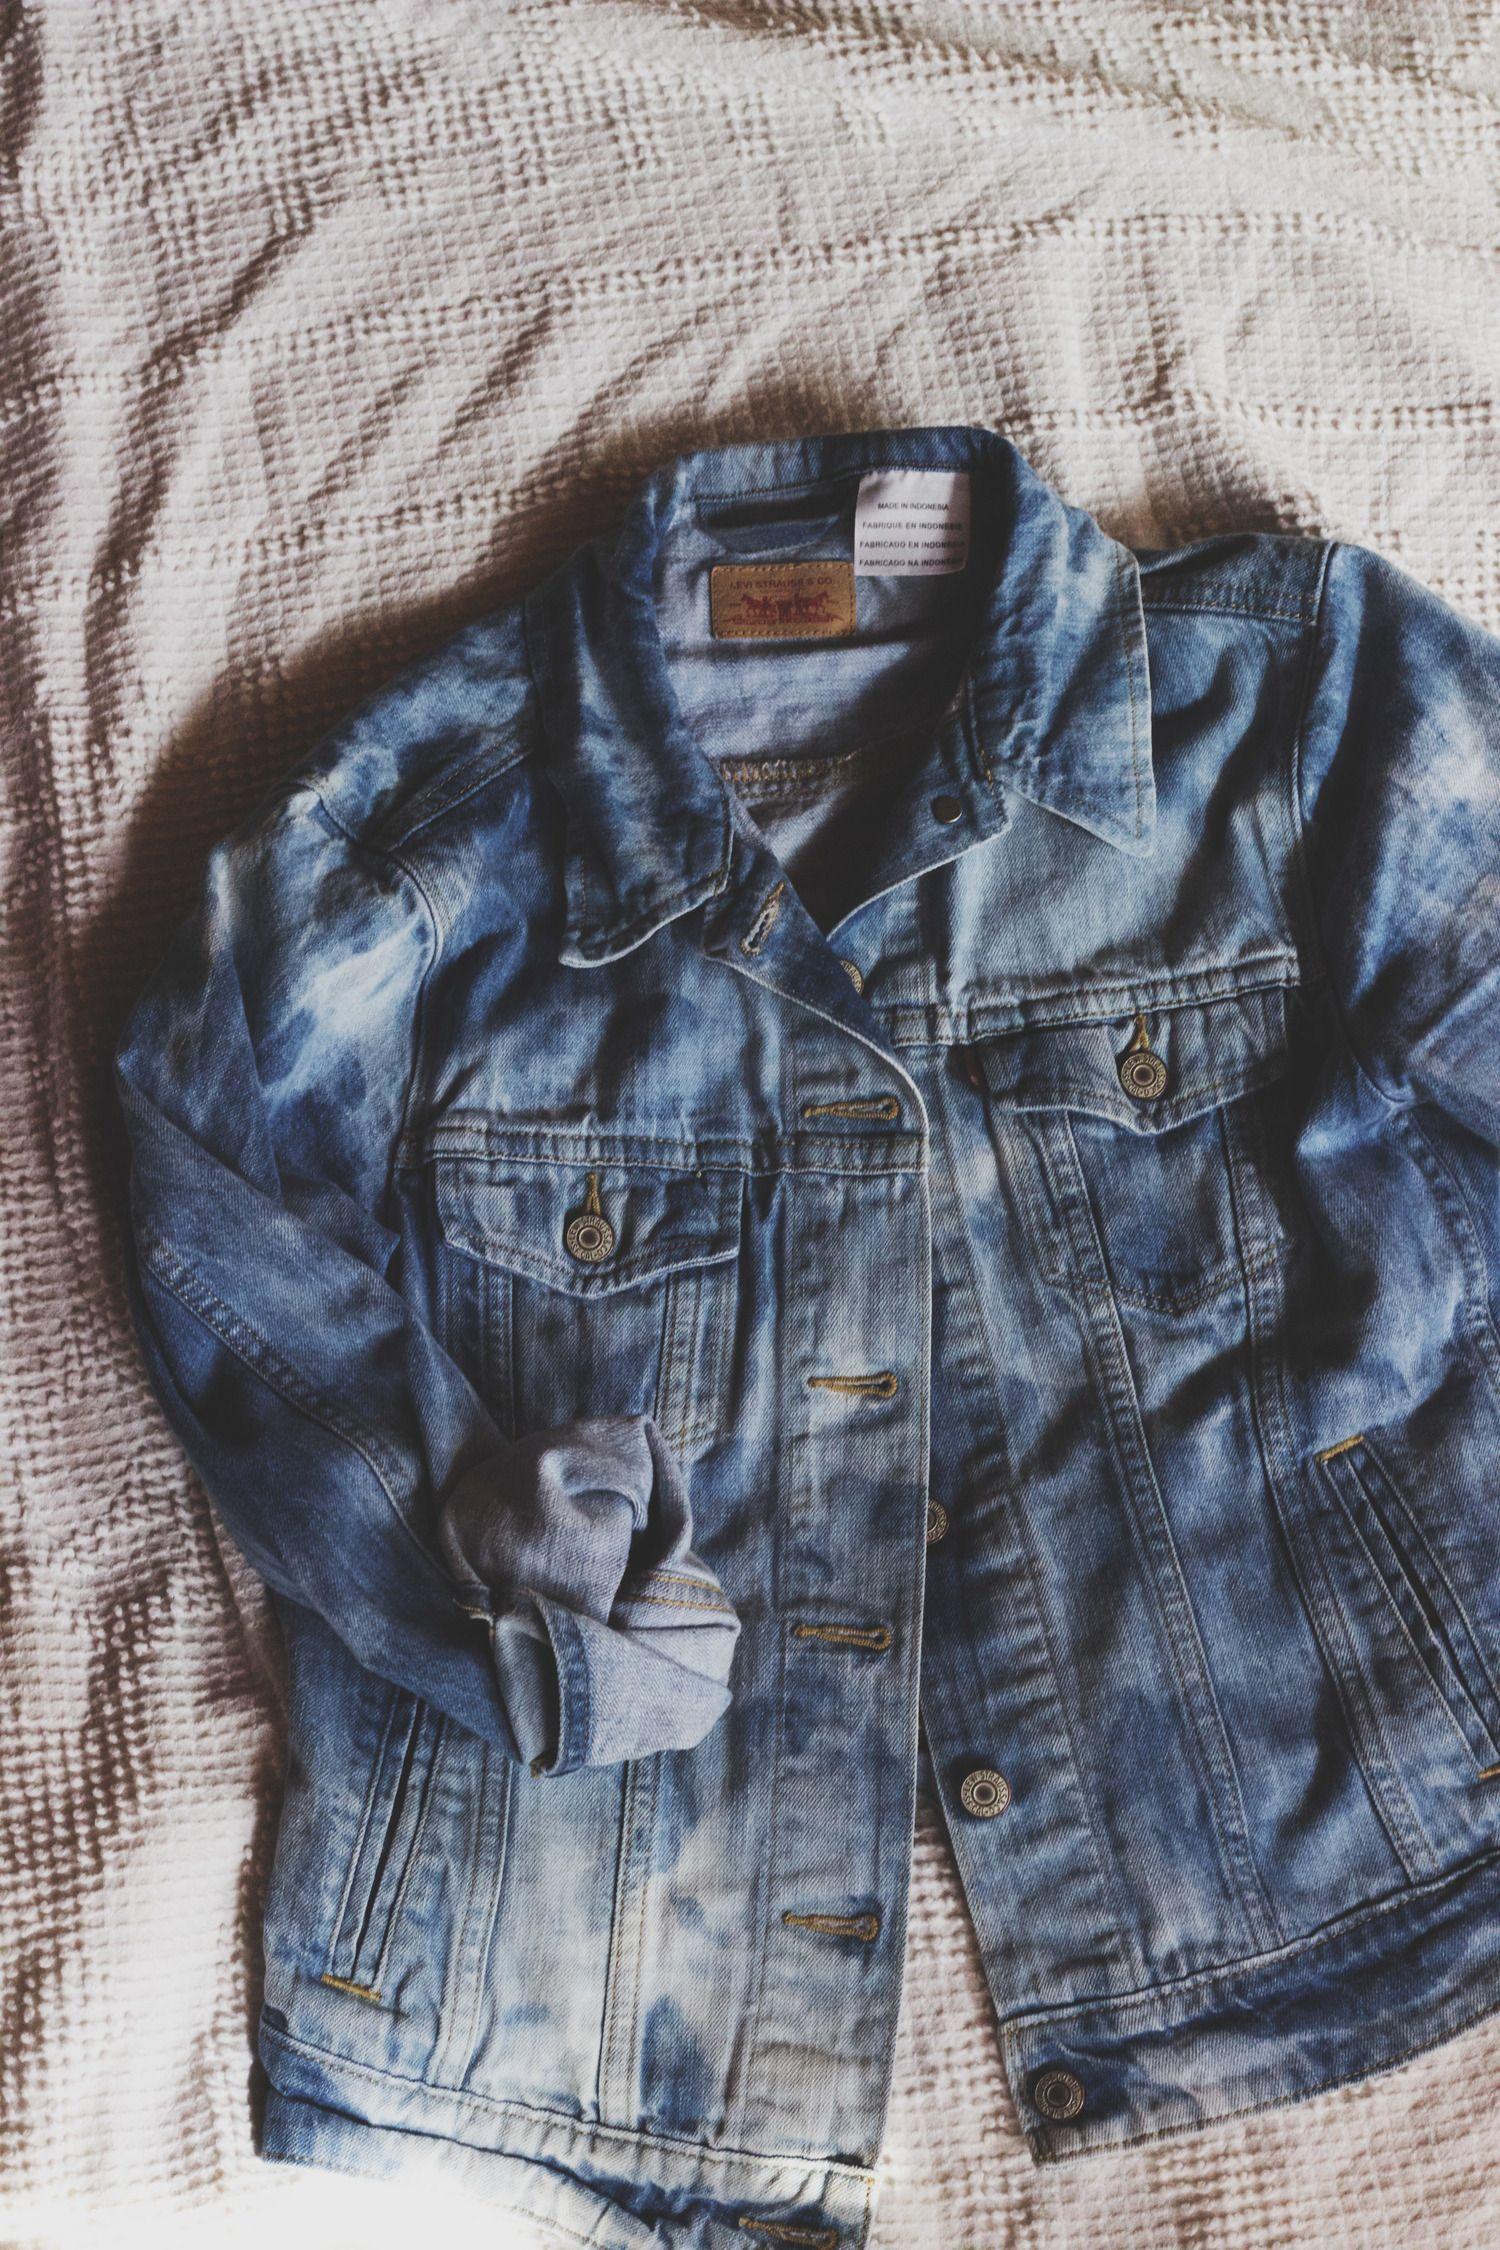 Stone Washing Denim How To Lighten Your Jean Jacket With Bleach Bleached Denim Jacket Distressed Denim Jacket Diy Jean Jacket Diy [ 2250 x 1500 Pixel ]